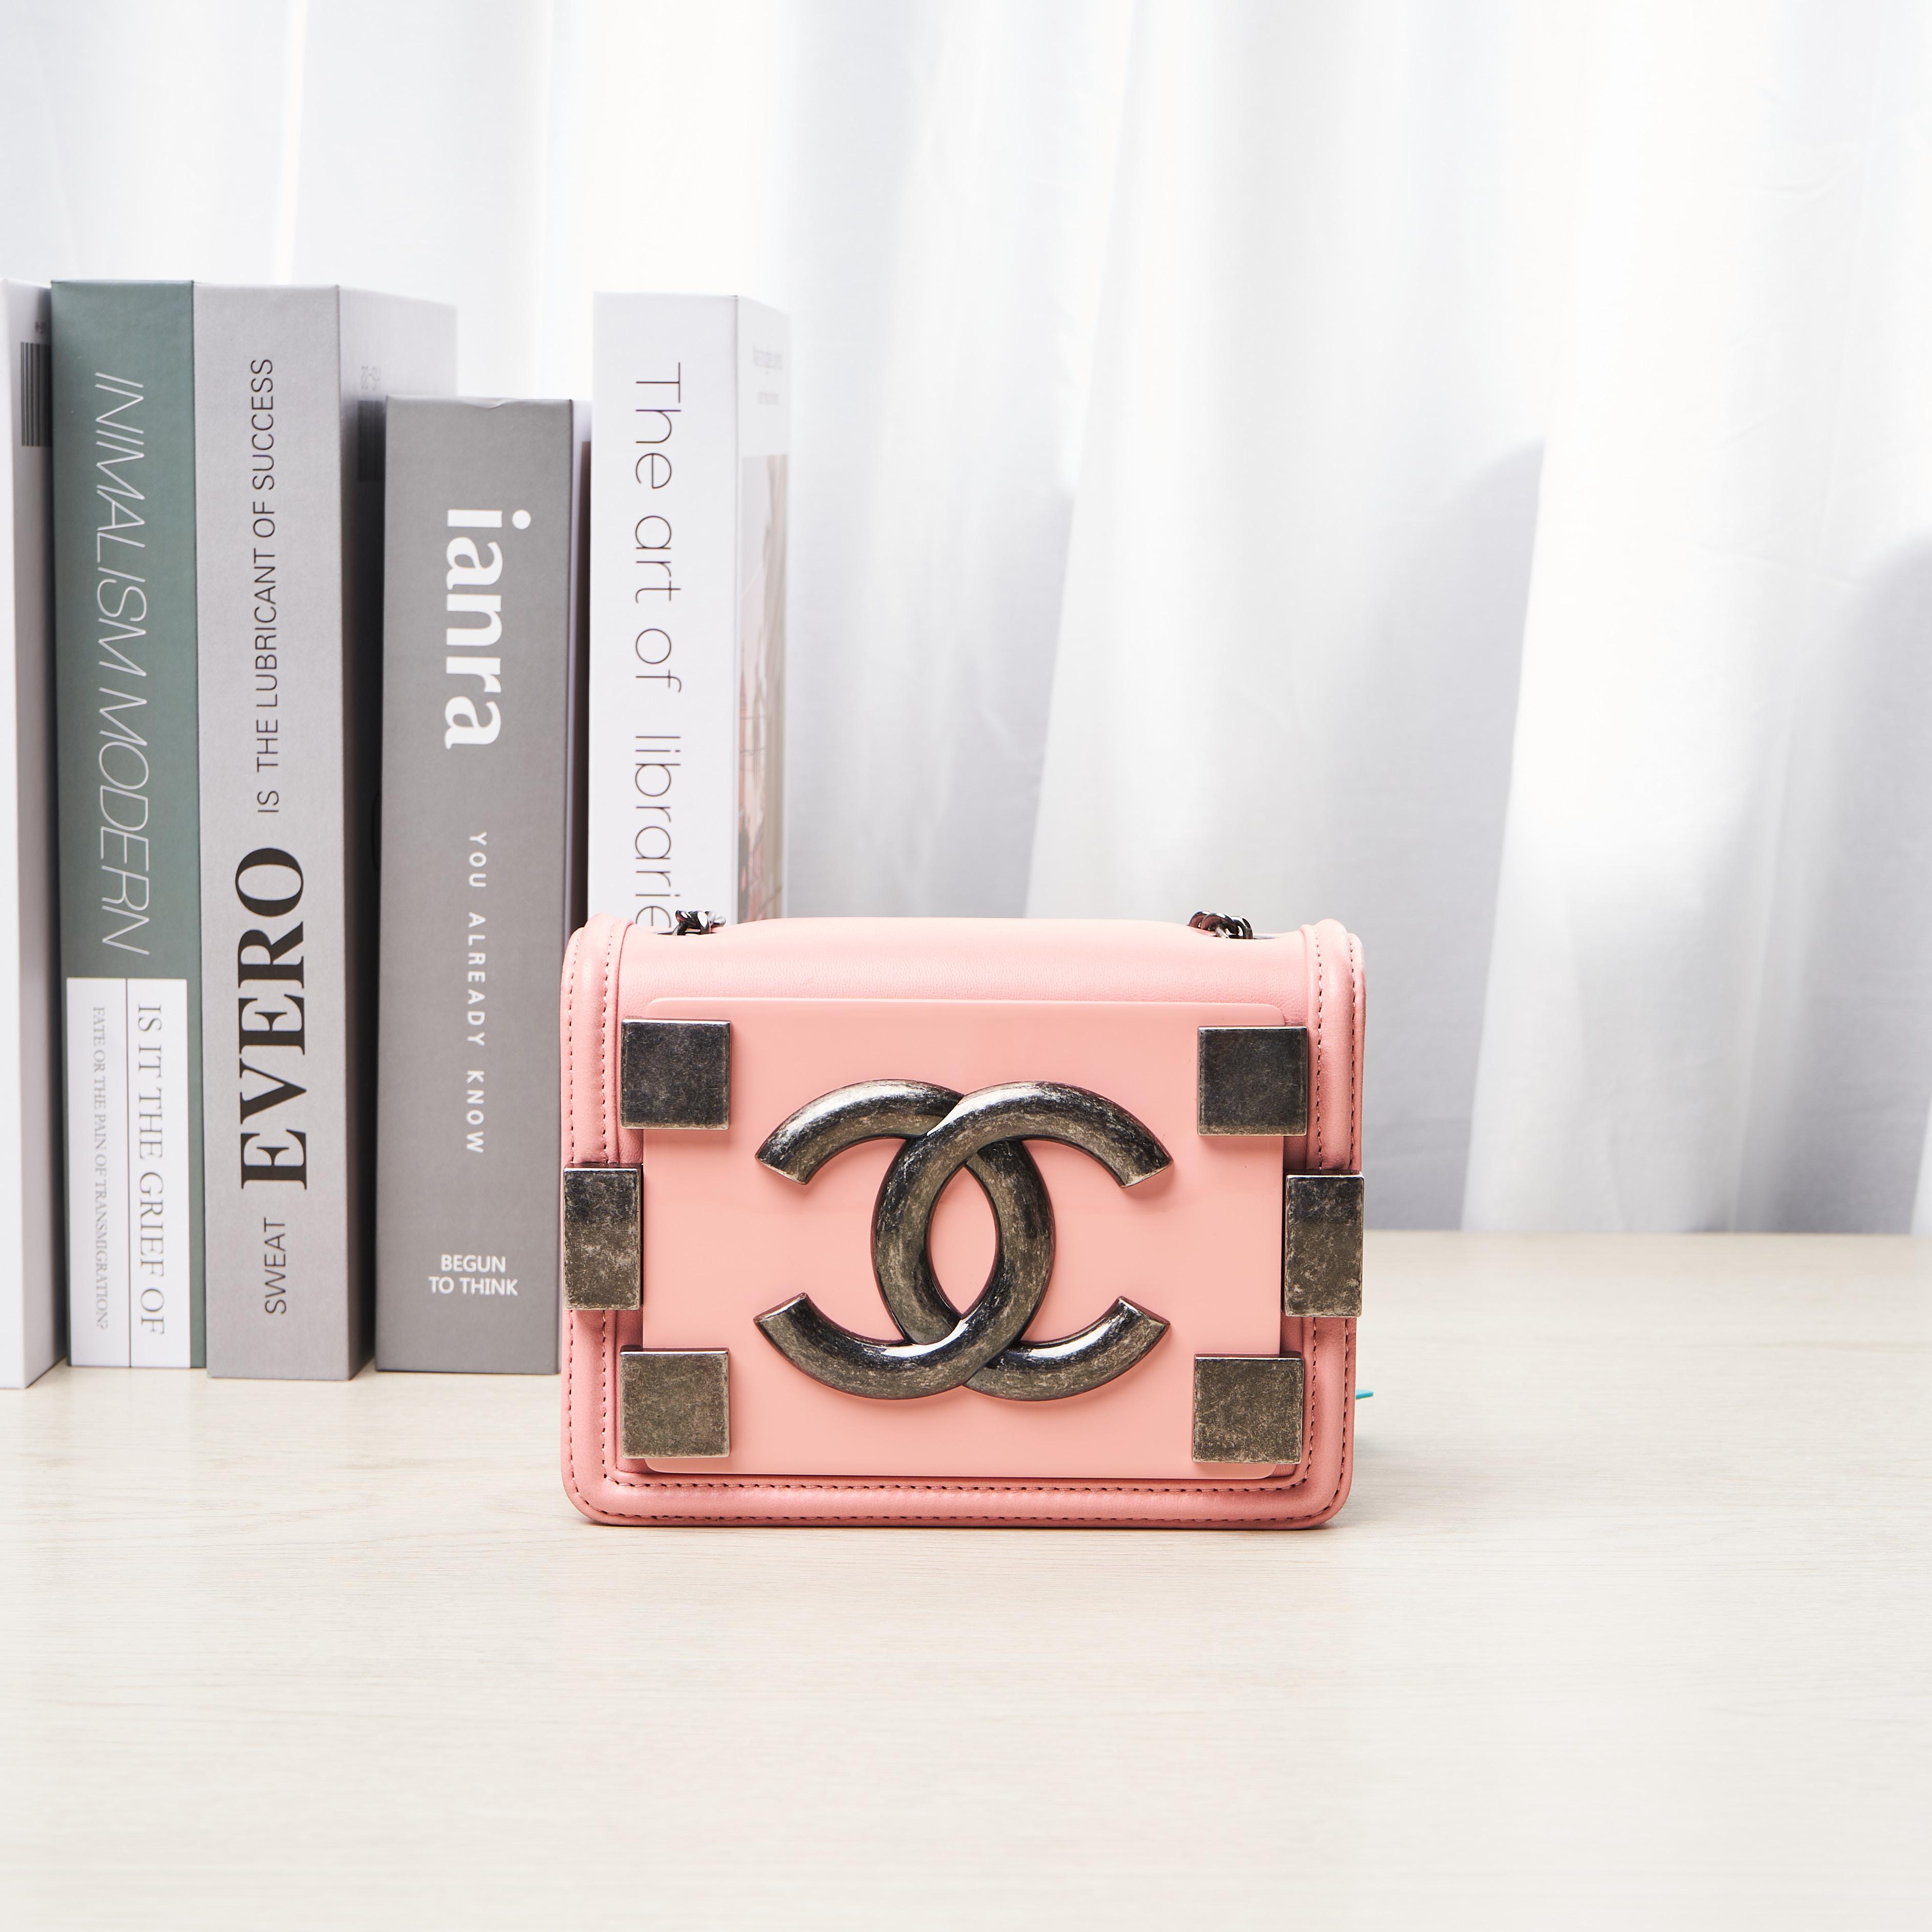 chanel链条包 临时【95新】香奈儿  Chanel 链条包 小号 公价¥16000_推荐淘宝好看的chanel链条包